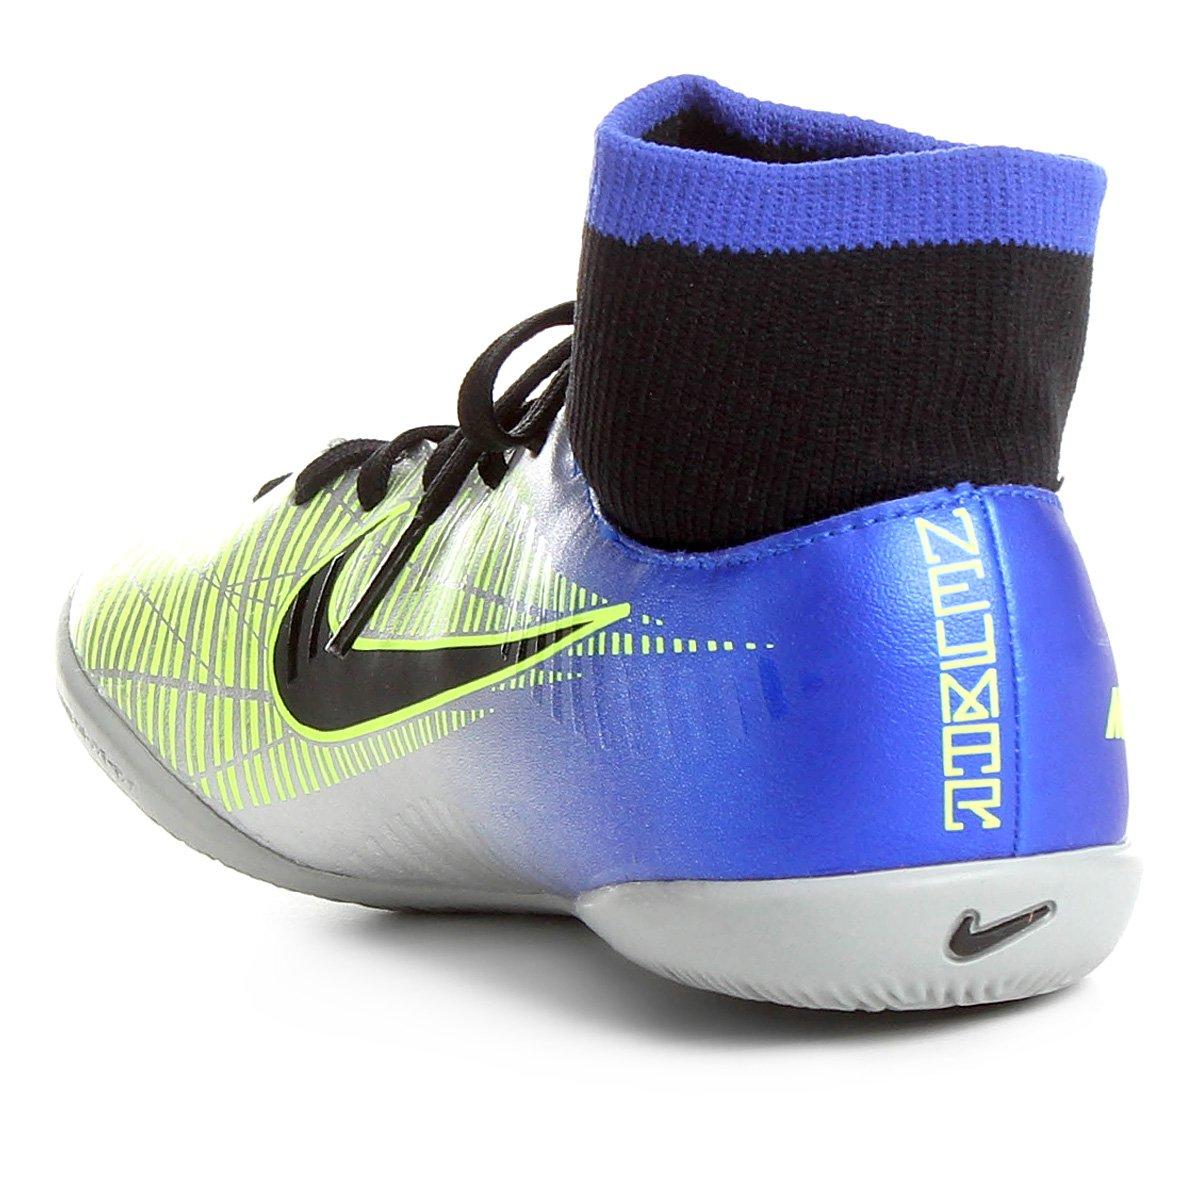 82957da4e Chuteira Futsal Infantil Nike Mercurial Victory 6 DF Neymar Jr IC ...